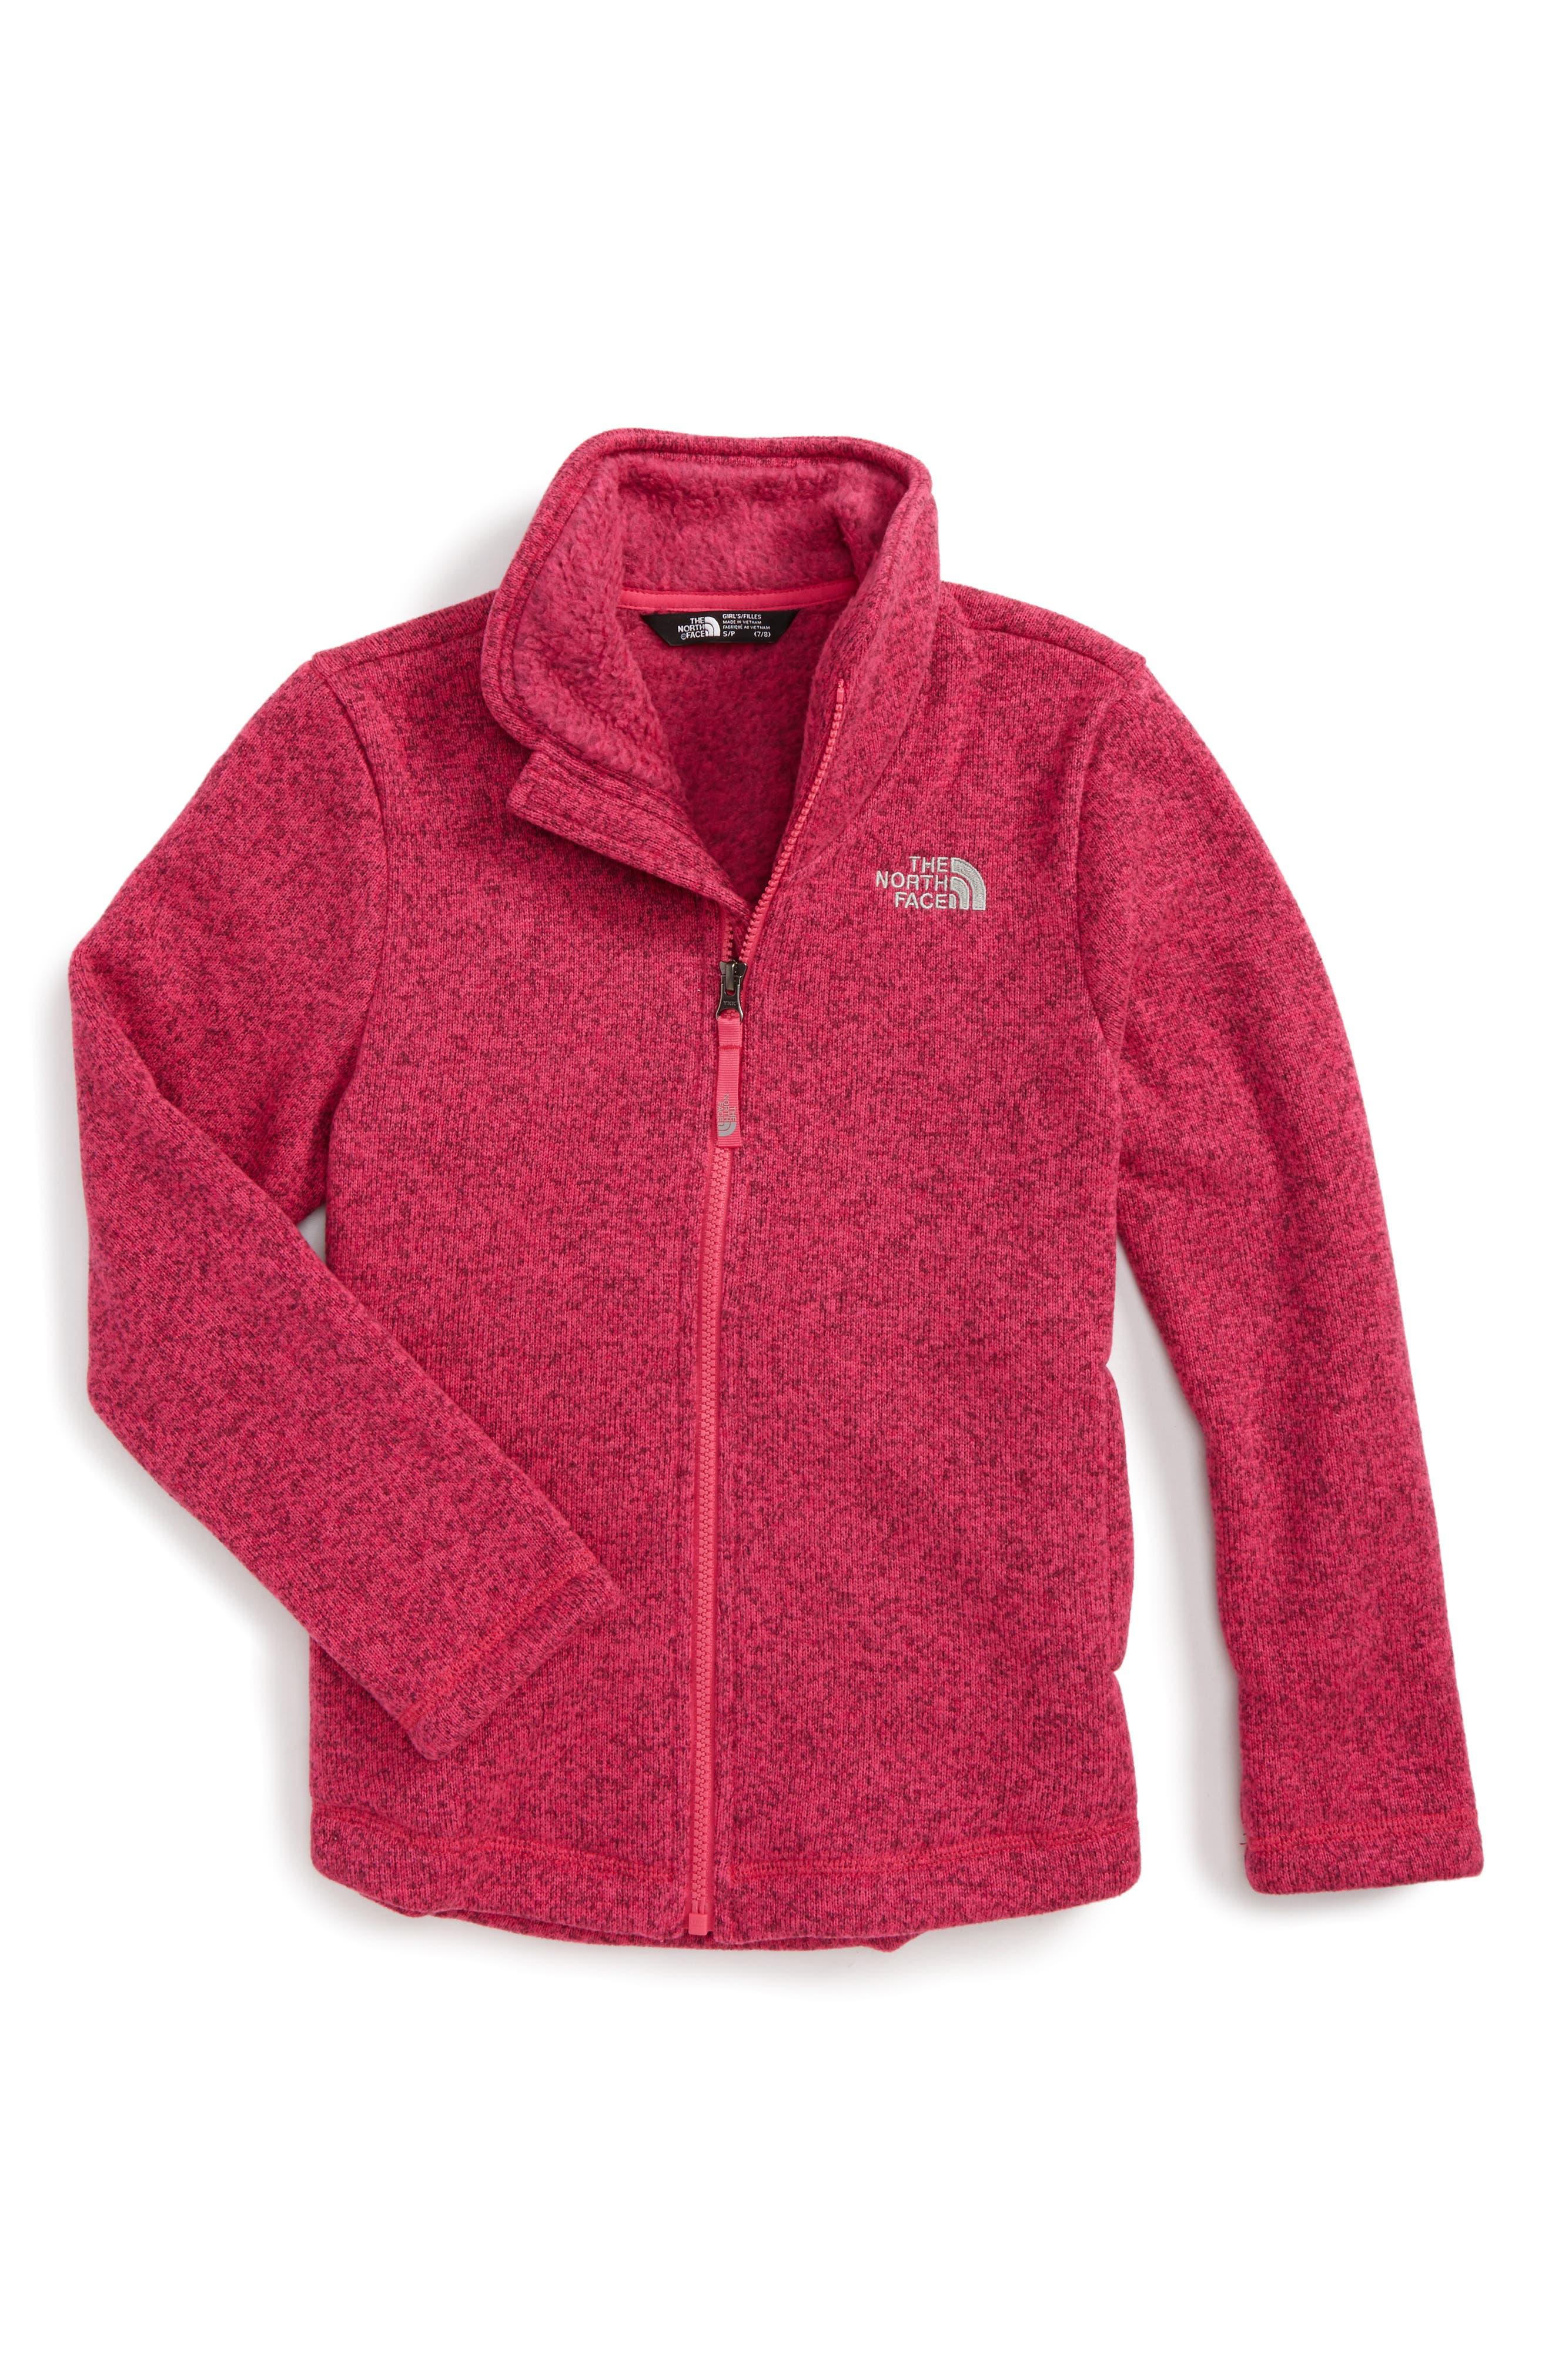 Crescent Fleece Jacket,                             Main thumbnail 4, color,